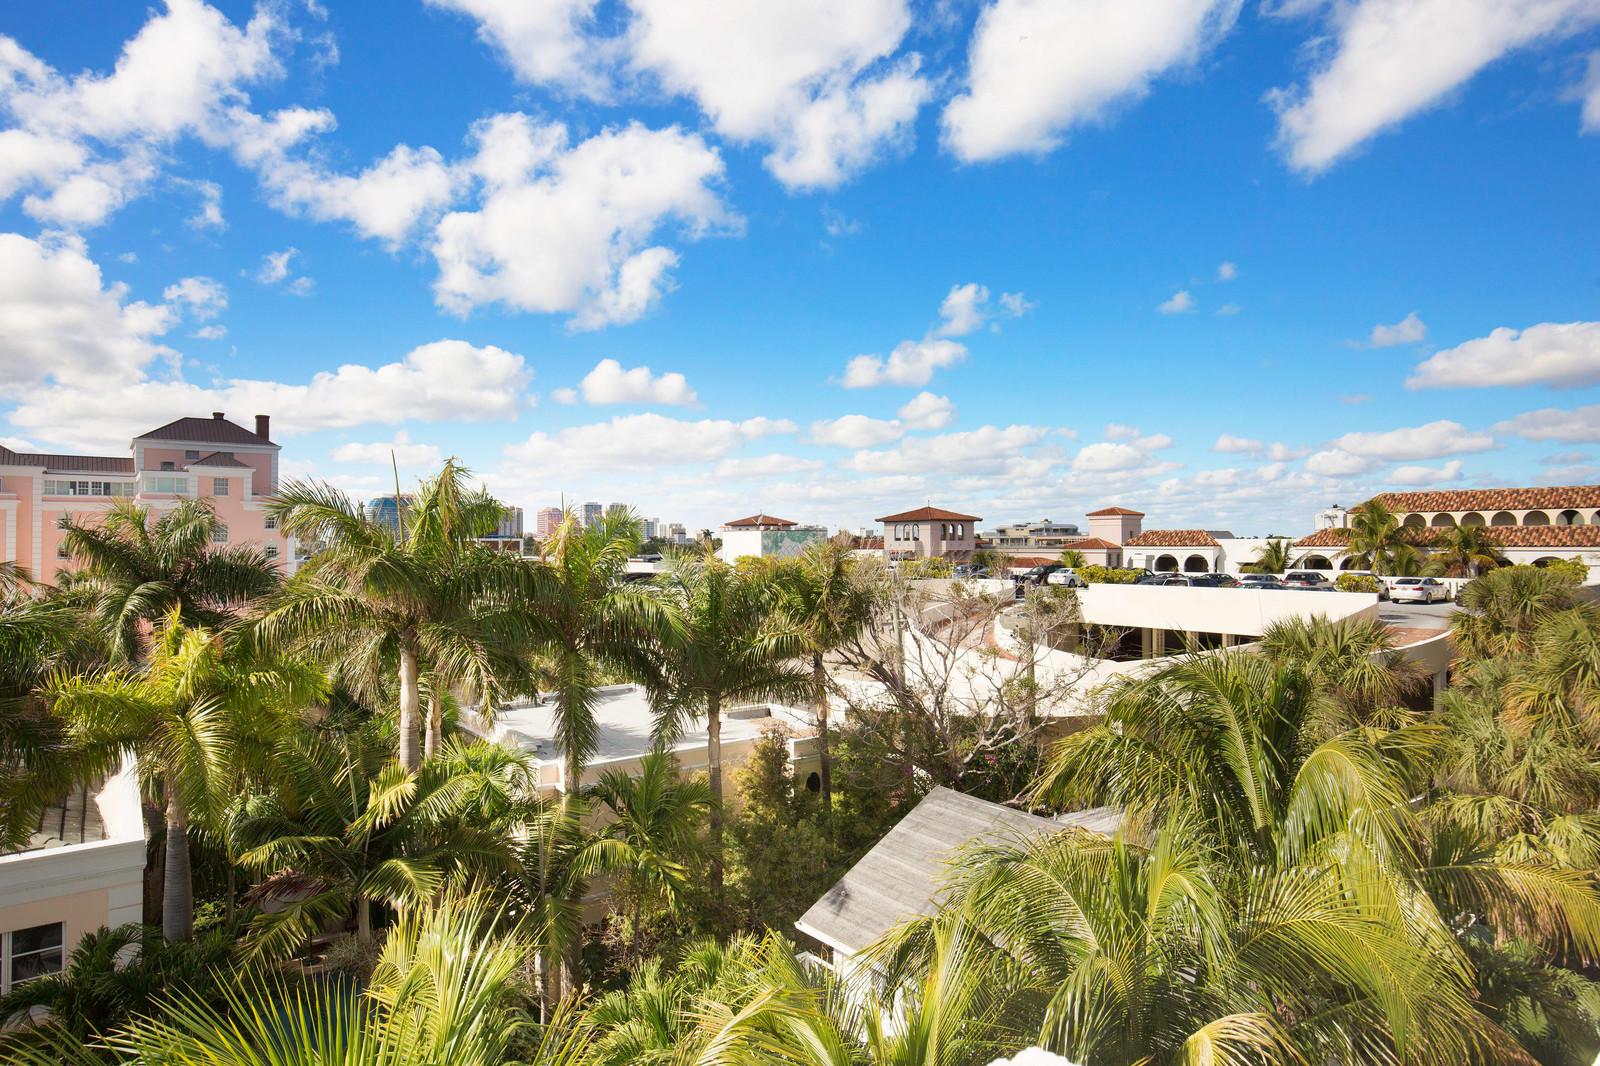 WINTHROP HOUSE PALM BEACH FLORIDA